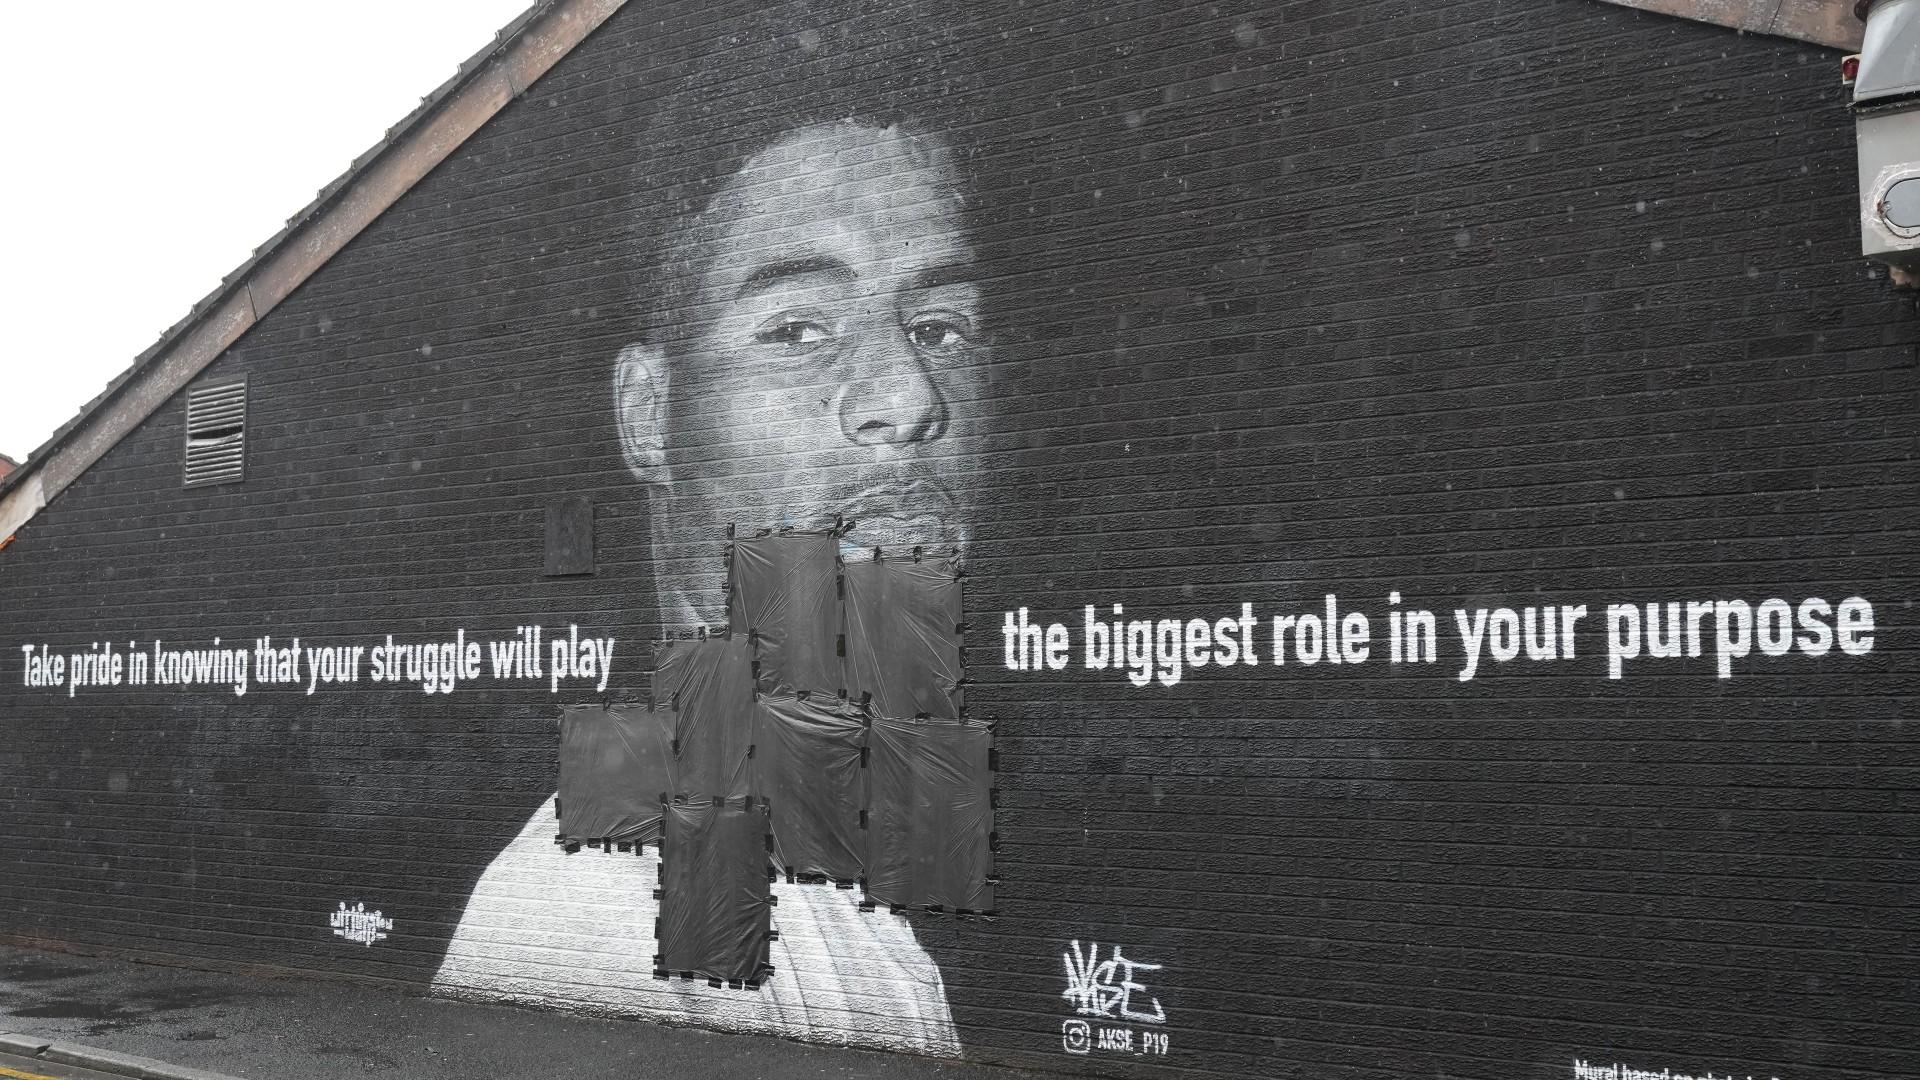 Marcus Rashford mural vandalised following England's Euro 2020 final loss  to Italy | Goal.com